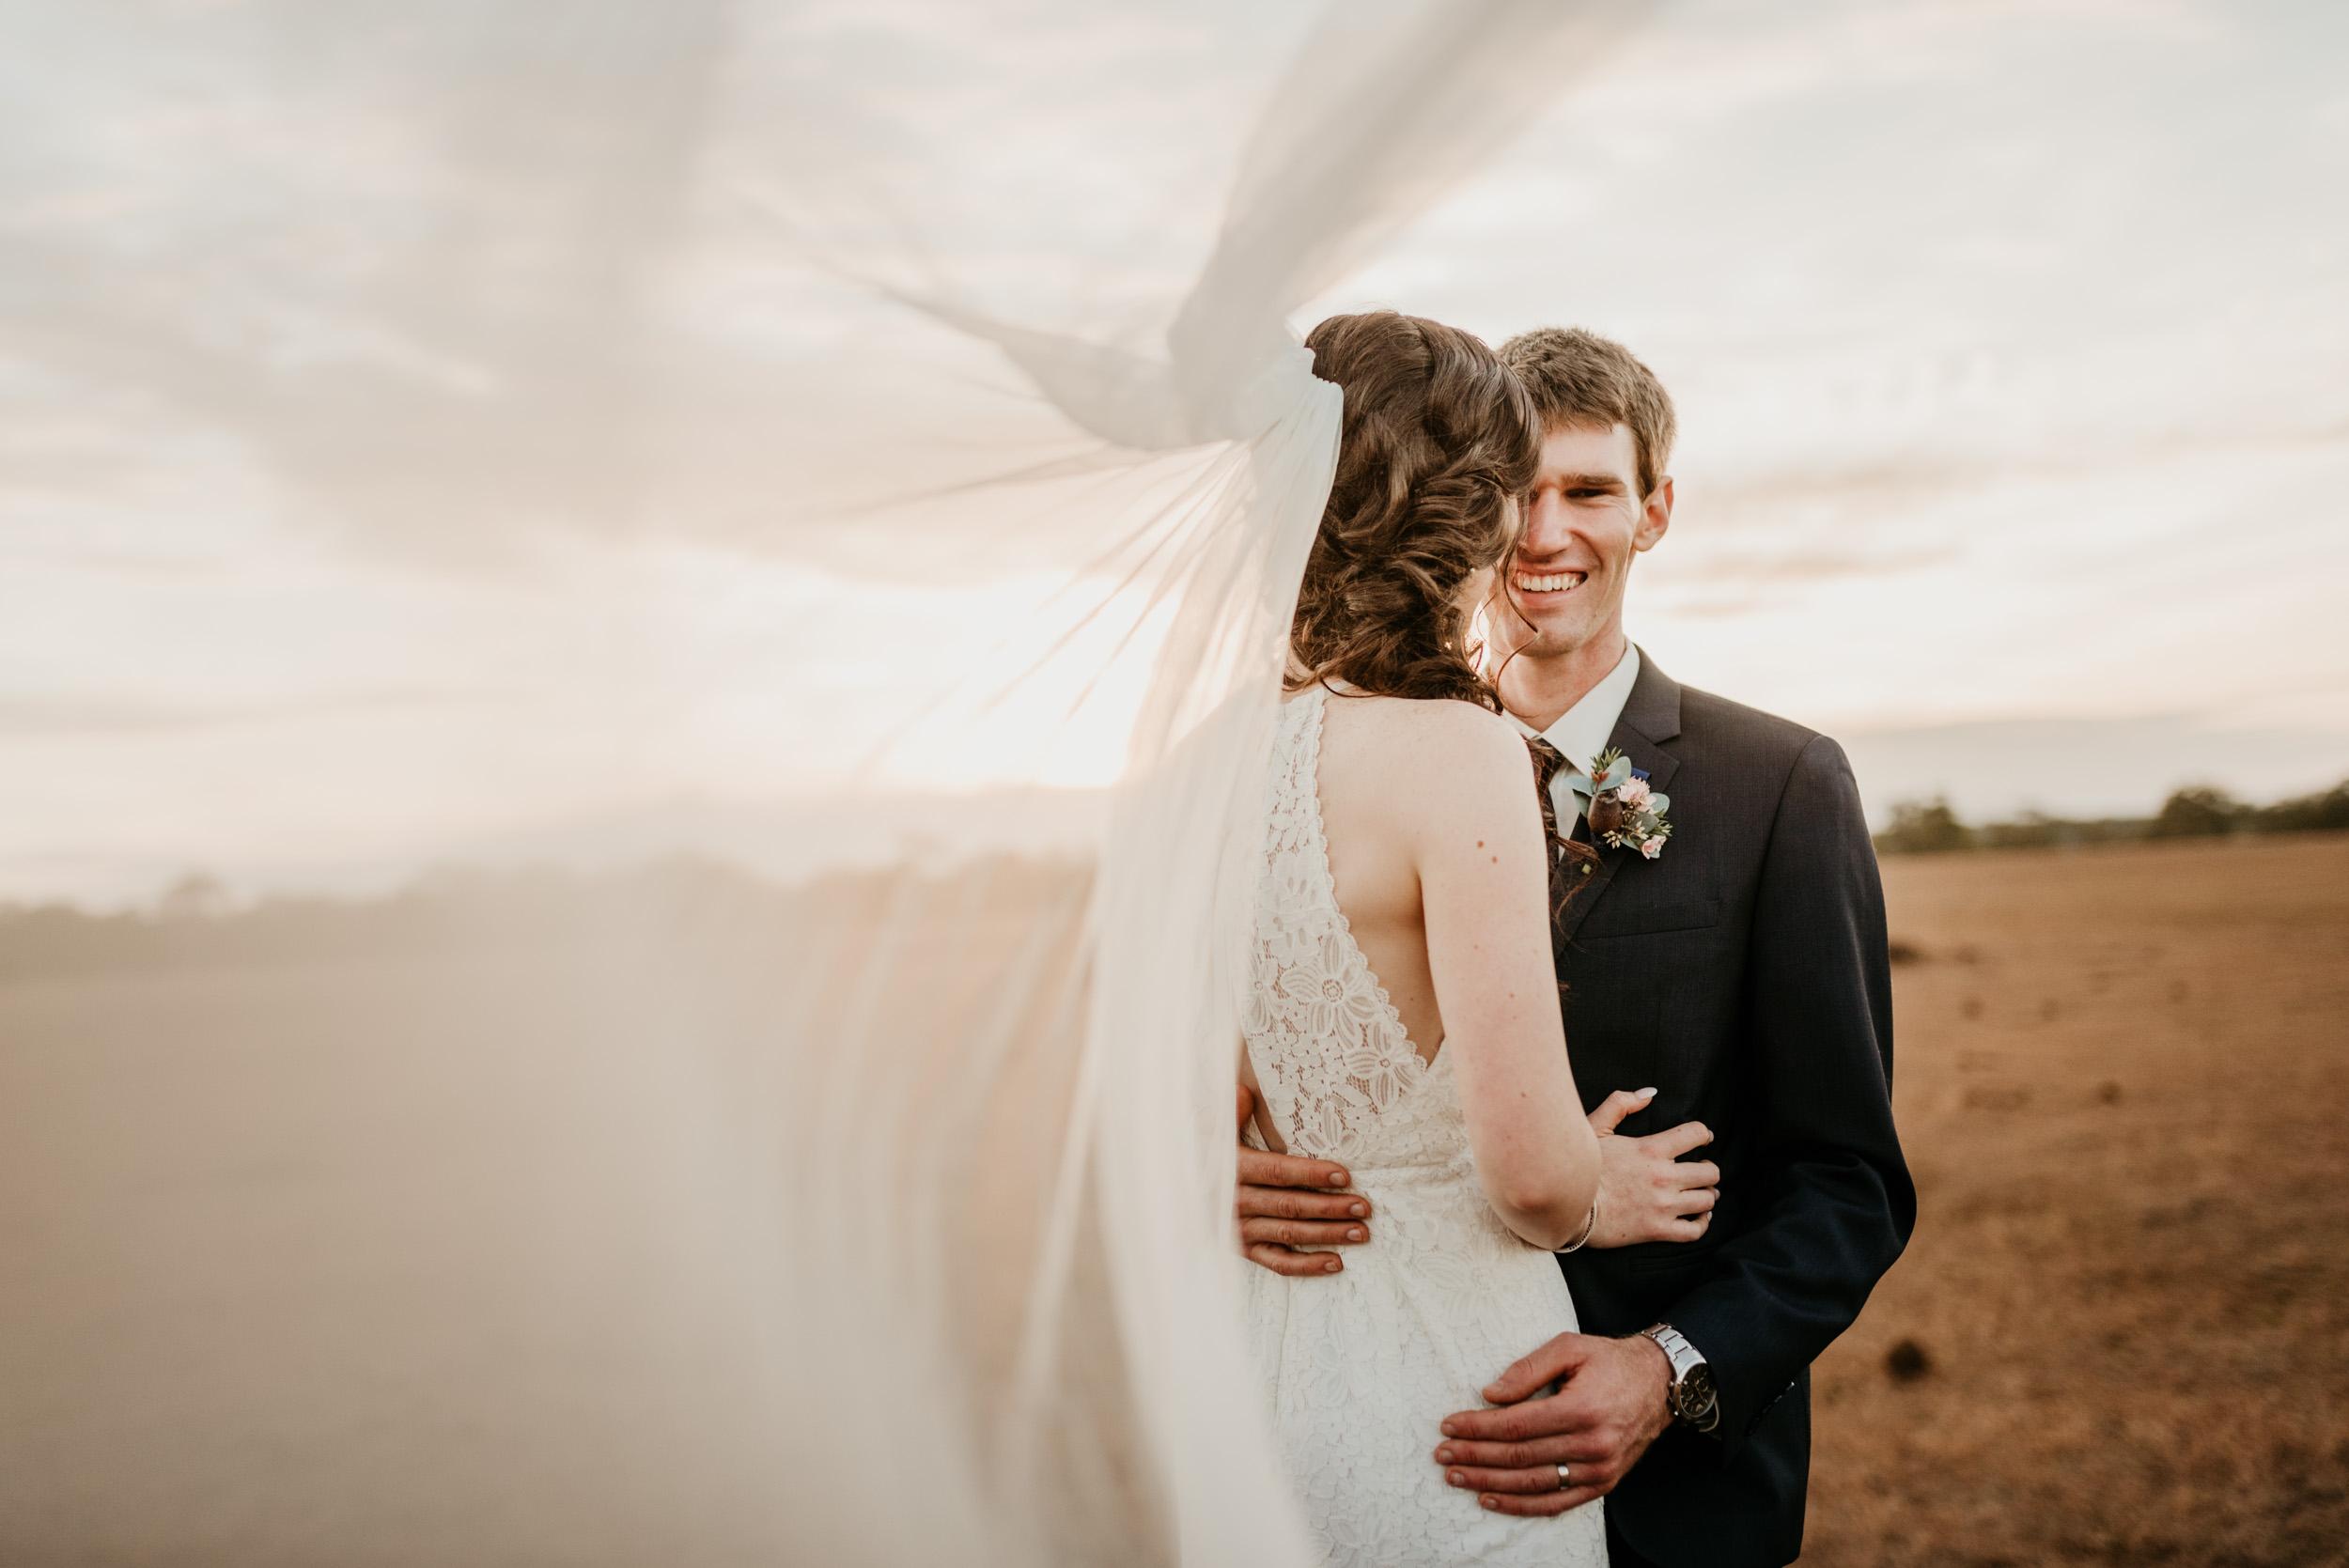 The Raw Photographer - Cairns Wedding Photographer - Atherton Tablelands Venue - Mareeba Photography-64.jpg